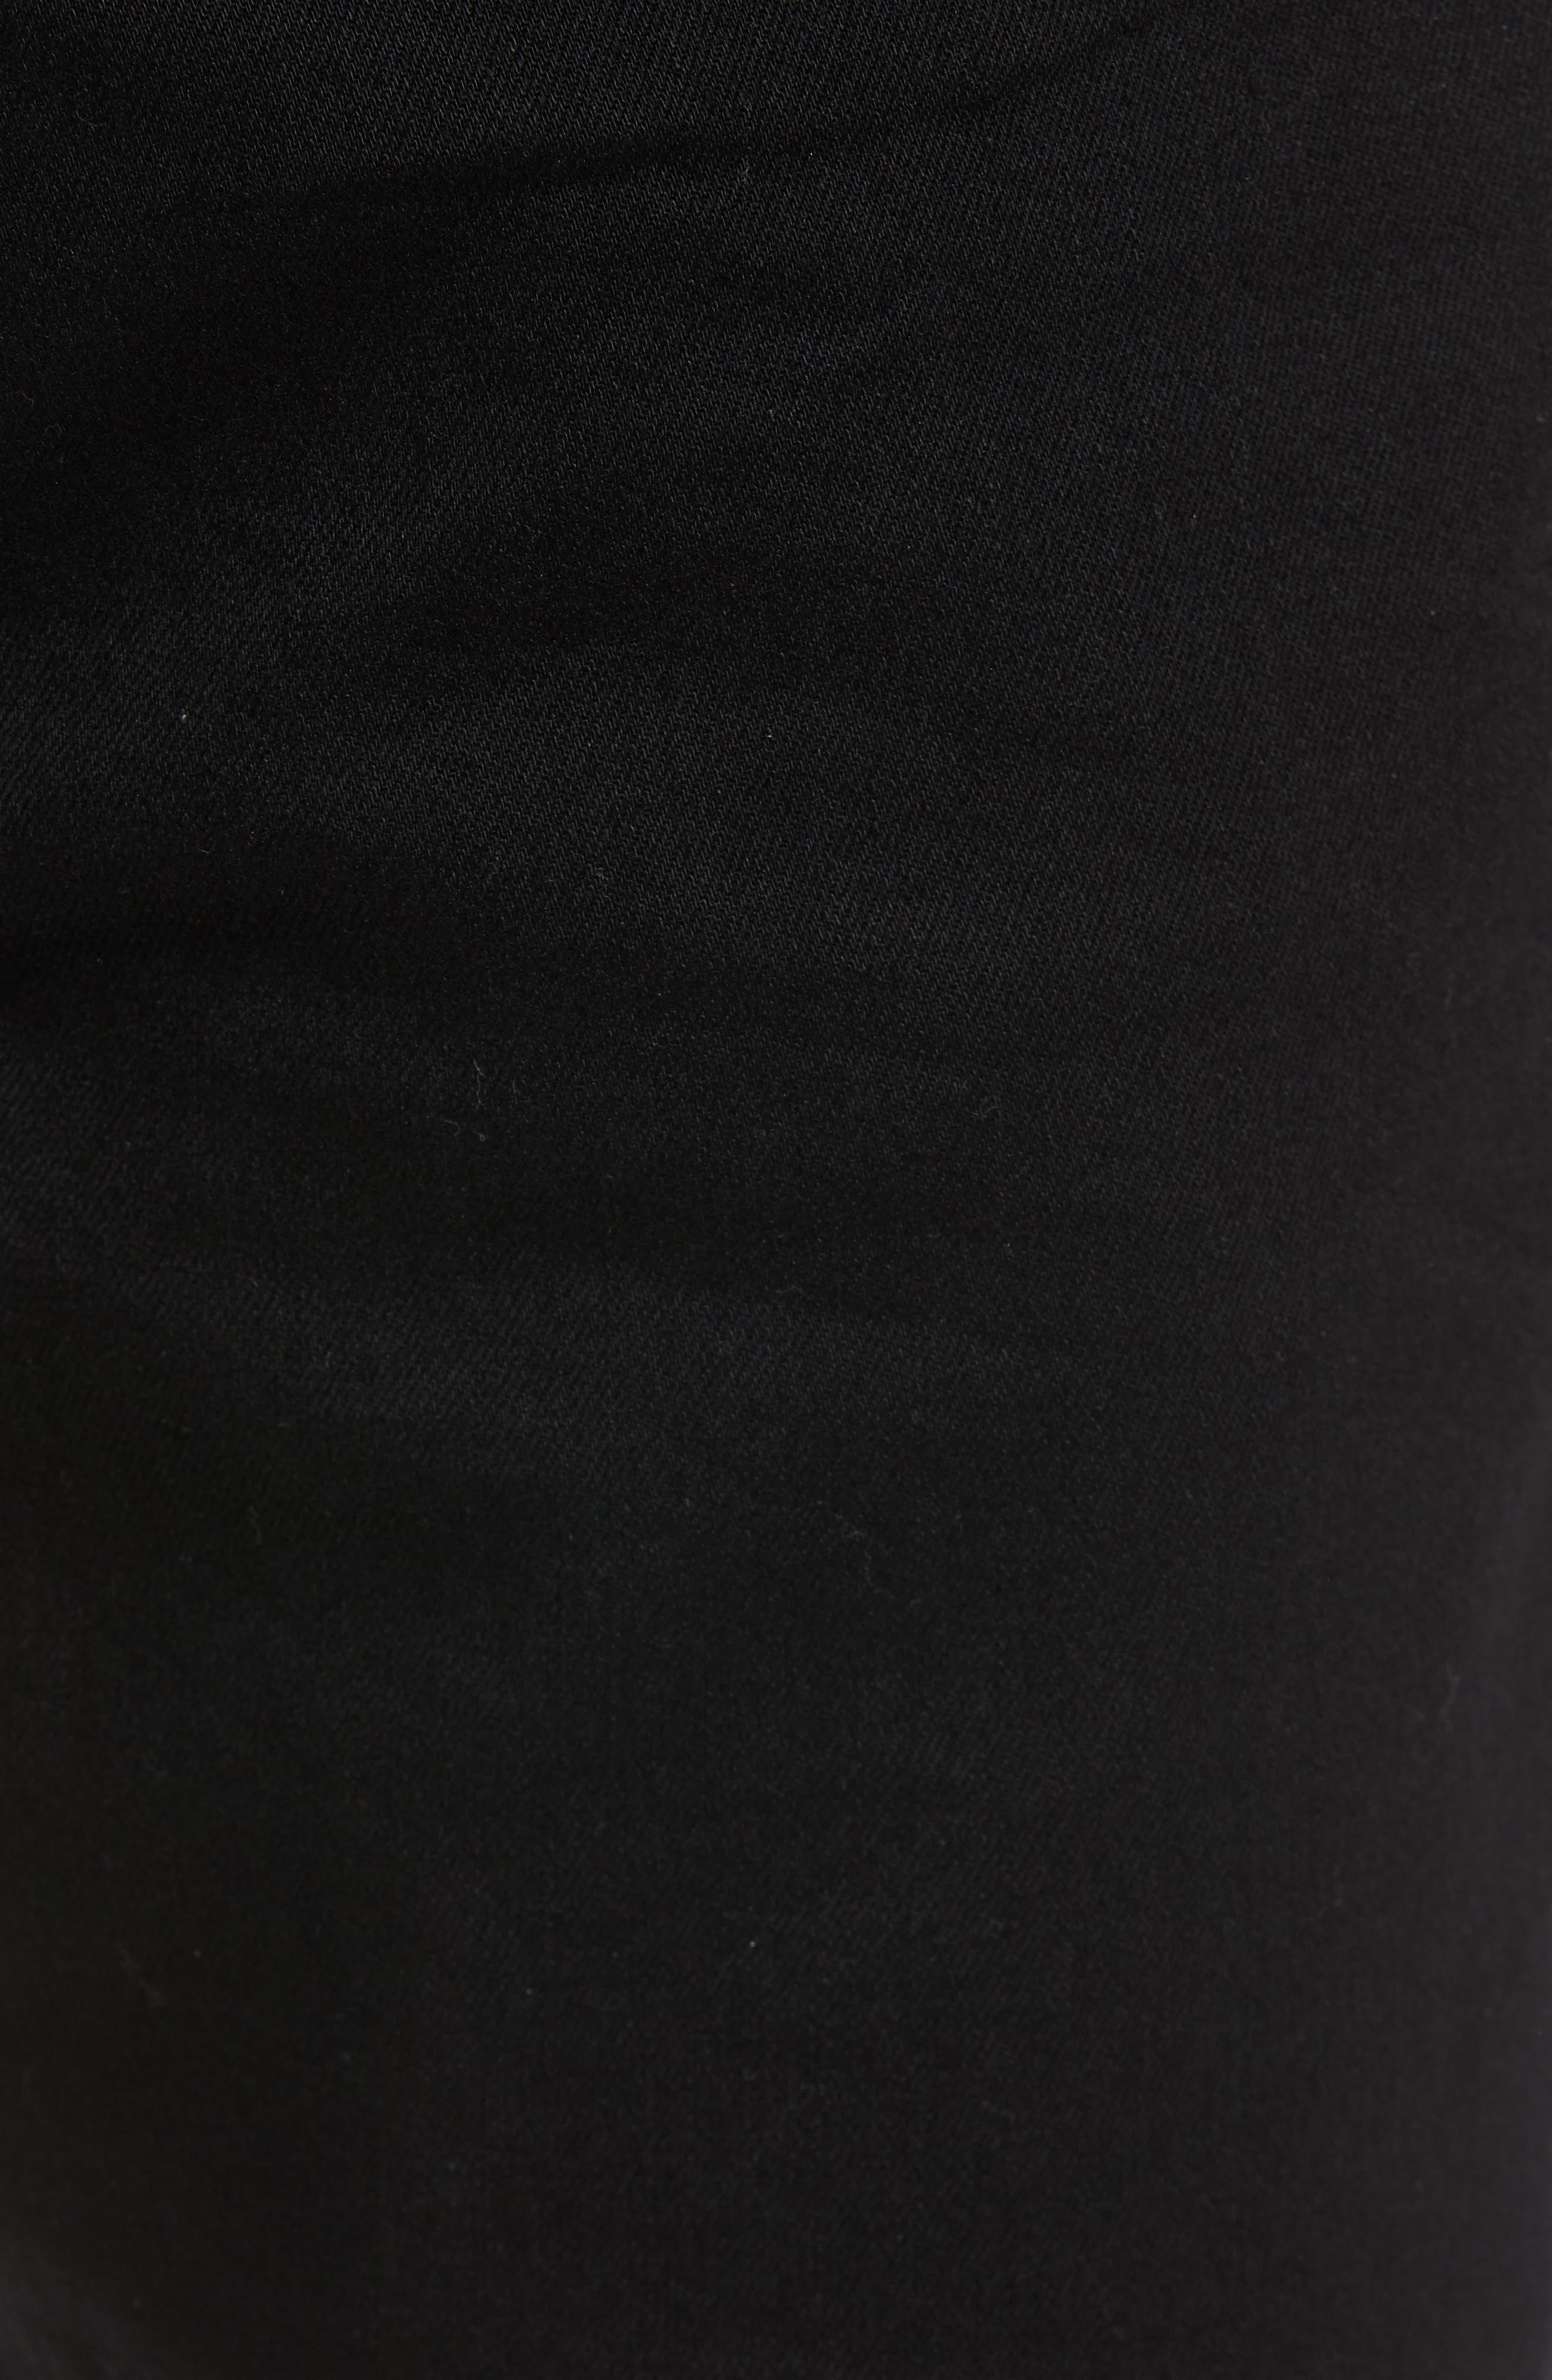 Hudson Axl Skinny Fit Jeans,                             Alternate thumbnail 5, color,                             Haskett